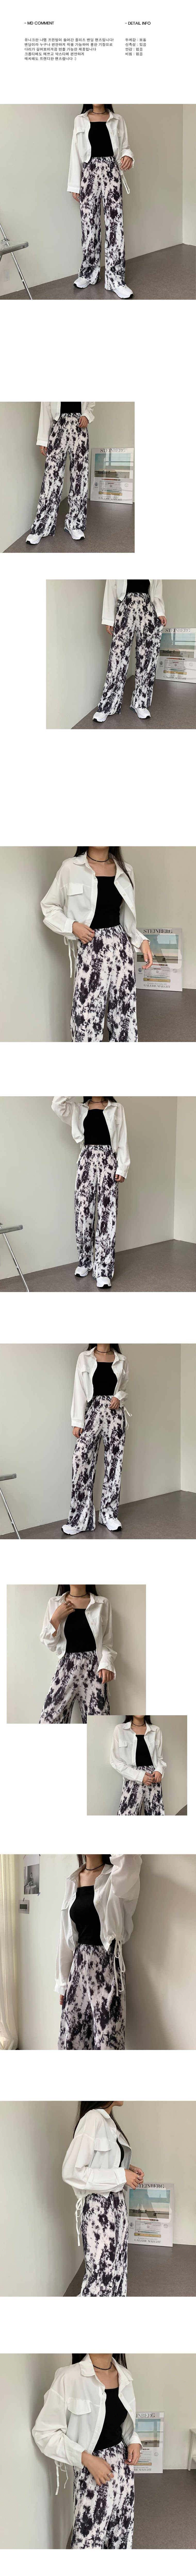 Tie-dye print pleated pleated trousers